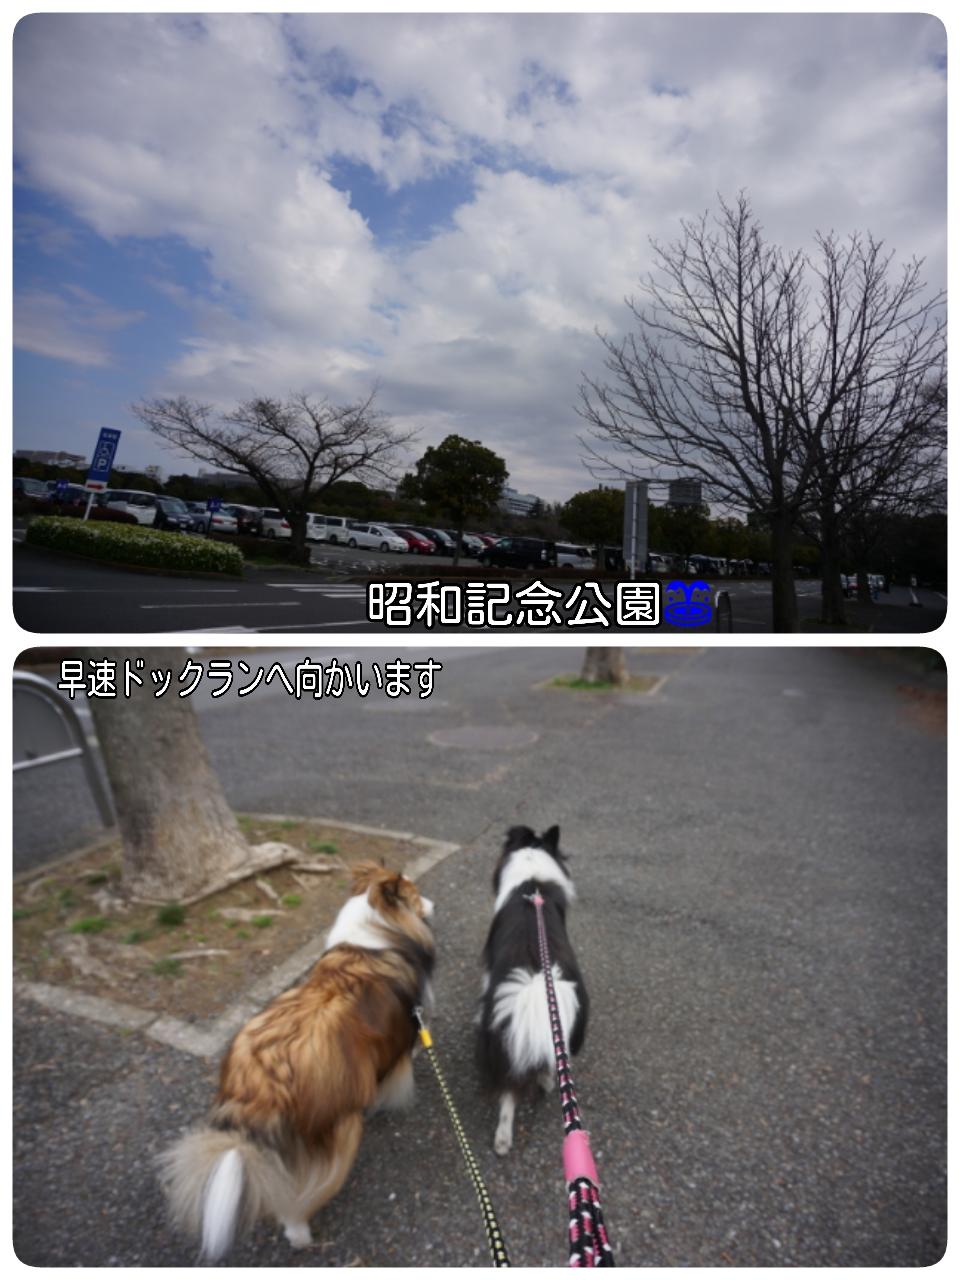 16-03-26-16-46-08-253_deco.jpg